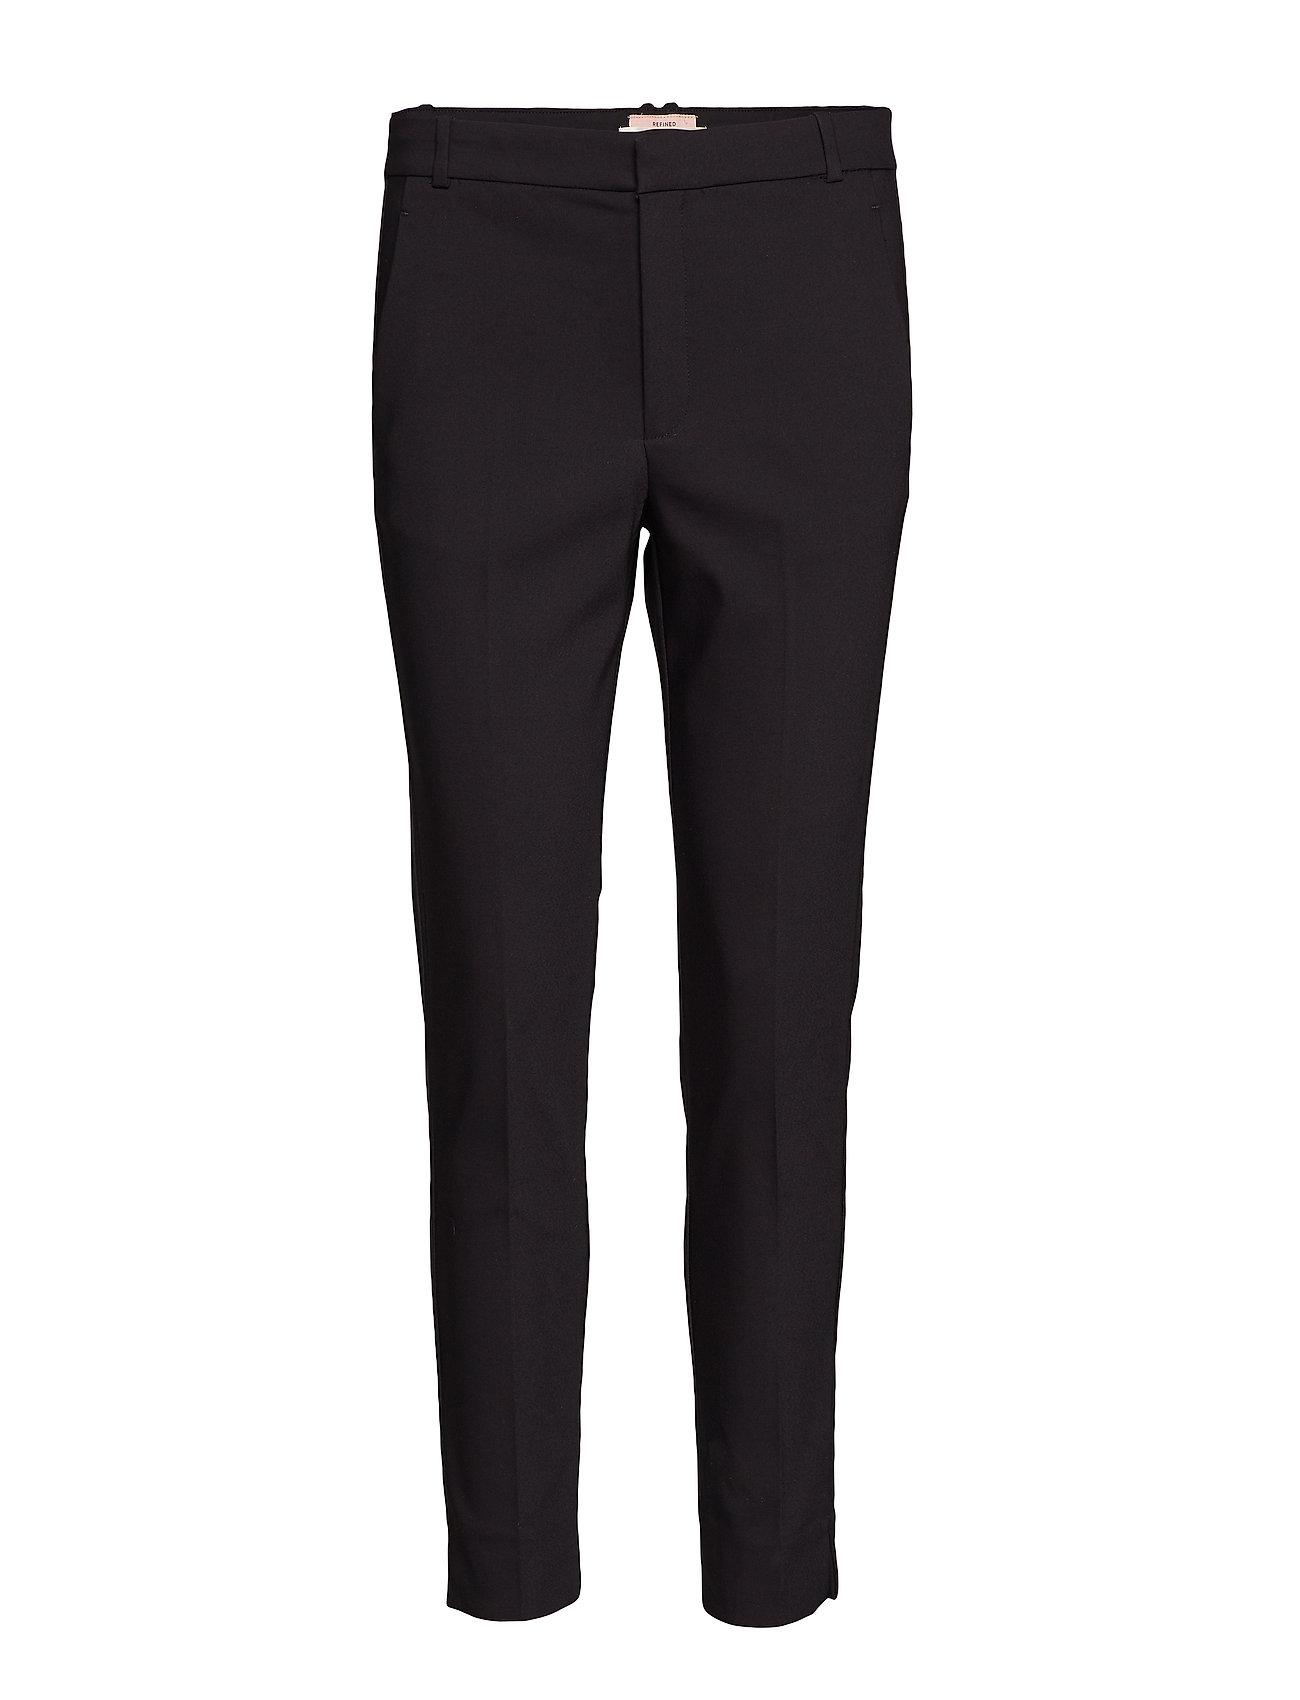 InWear Zella Pant - BLACK